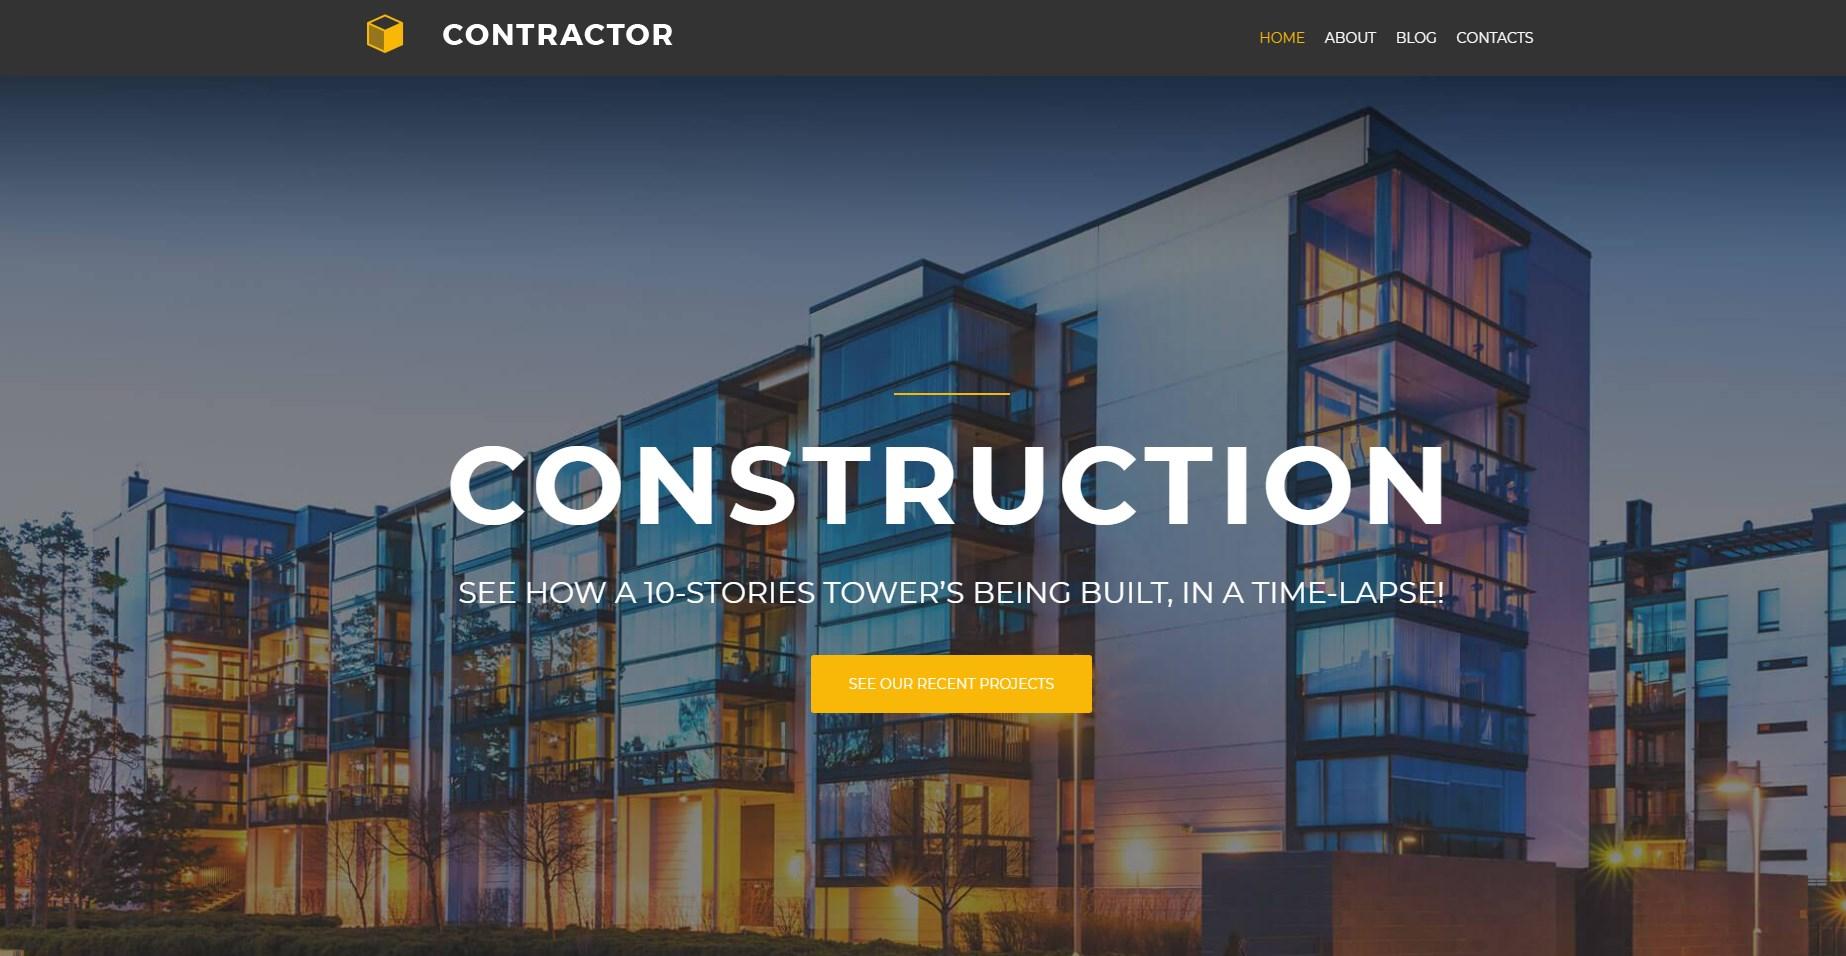 Contractor lite - Architecture & Construction Company Elementor WordPress Theme